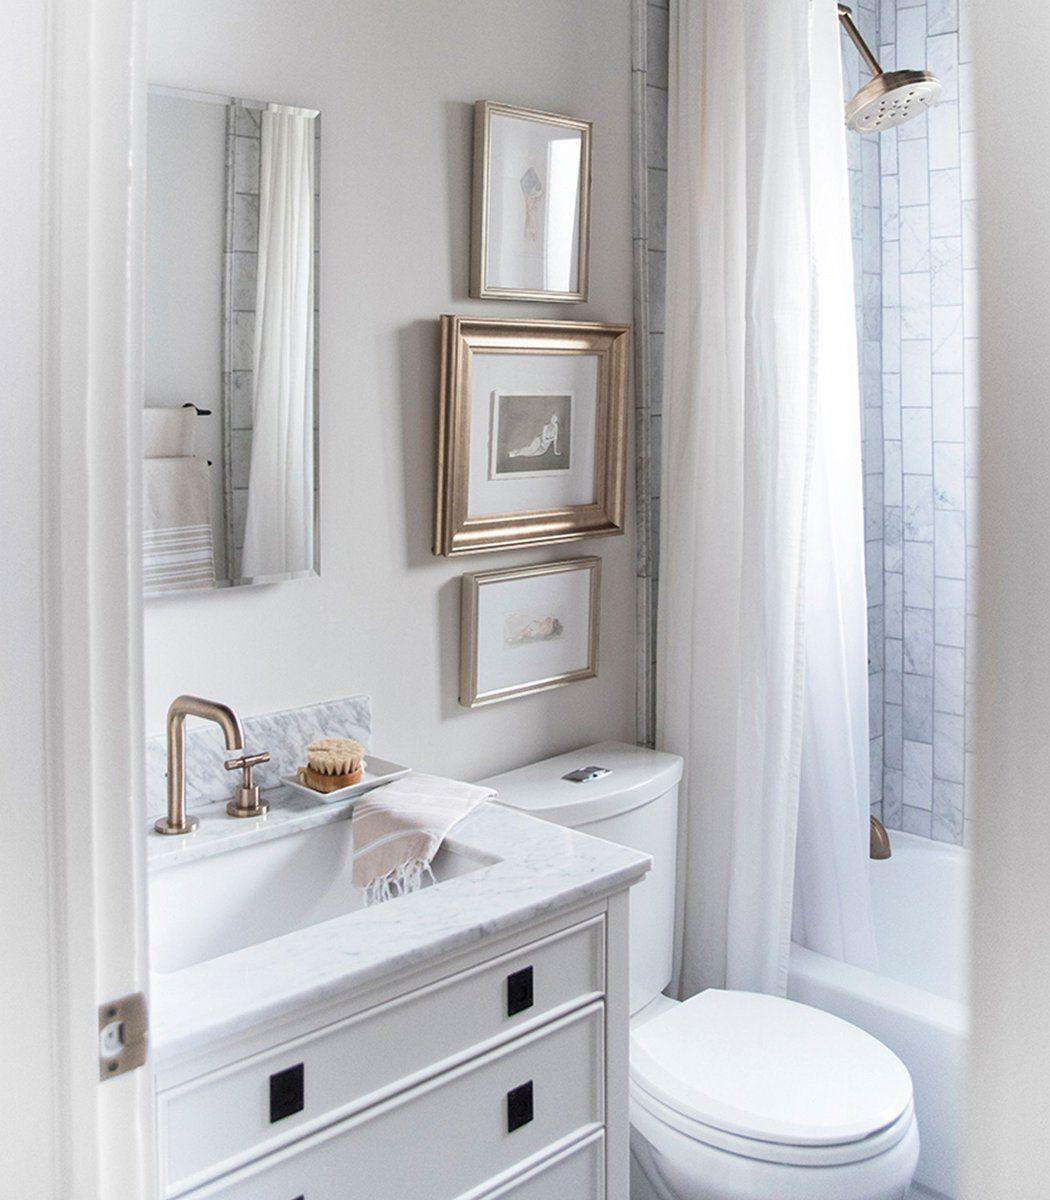 Sherwin Williams On Twitter Origami White Small Bathroom Gorgeous Bathroom